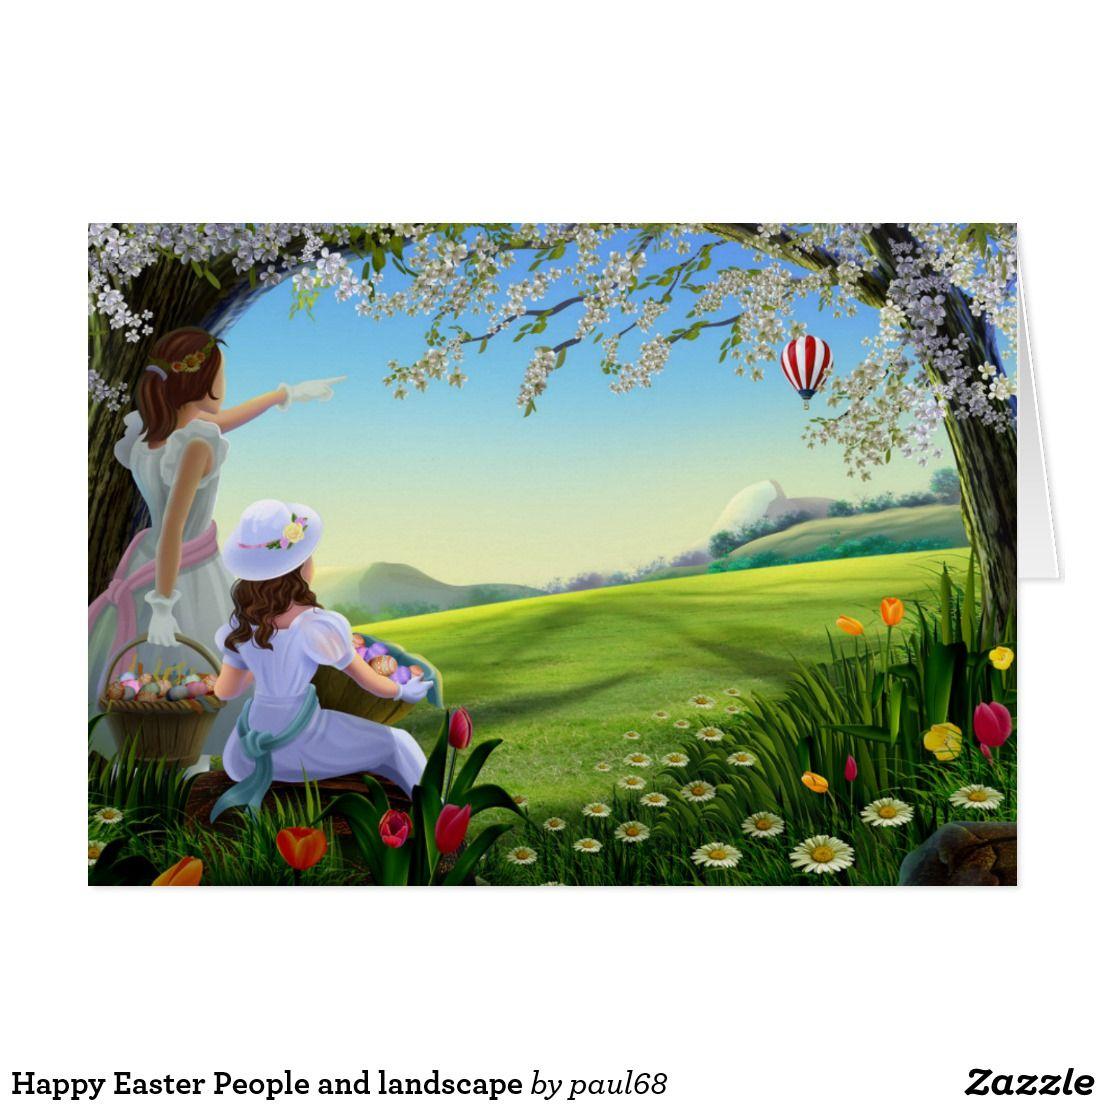 Happy Easter People and landscape Holiday Card   Zazzle.com #springdesktopwallpaper